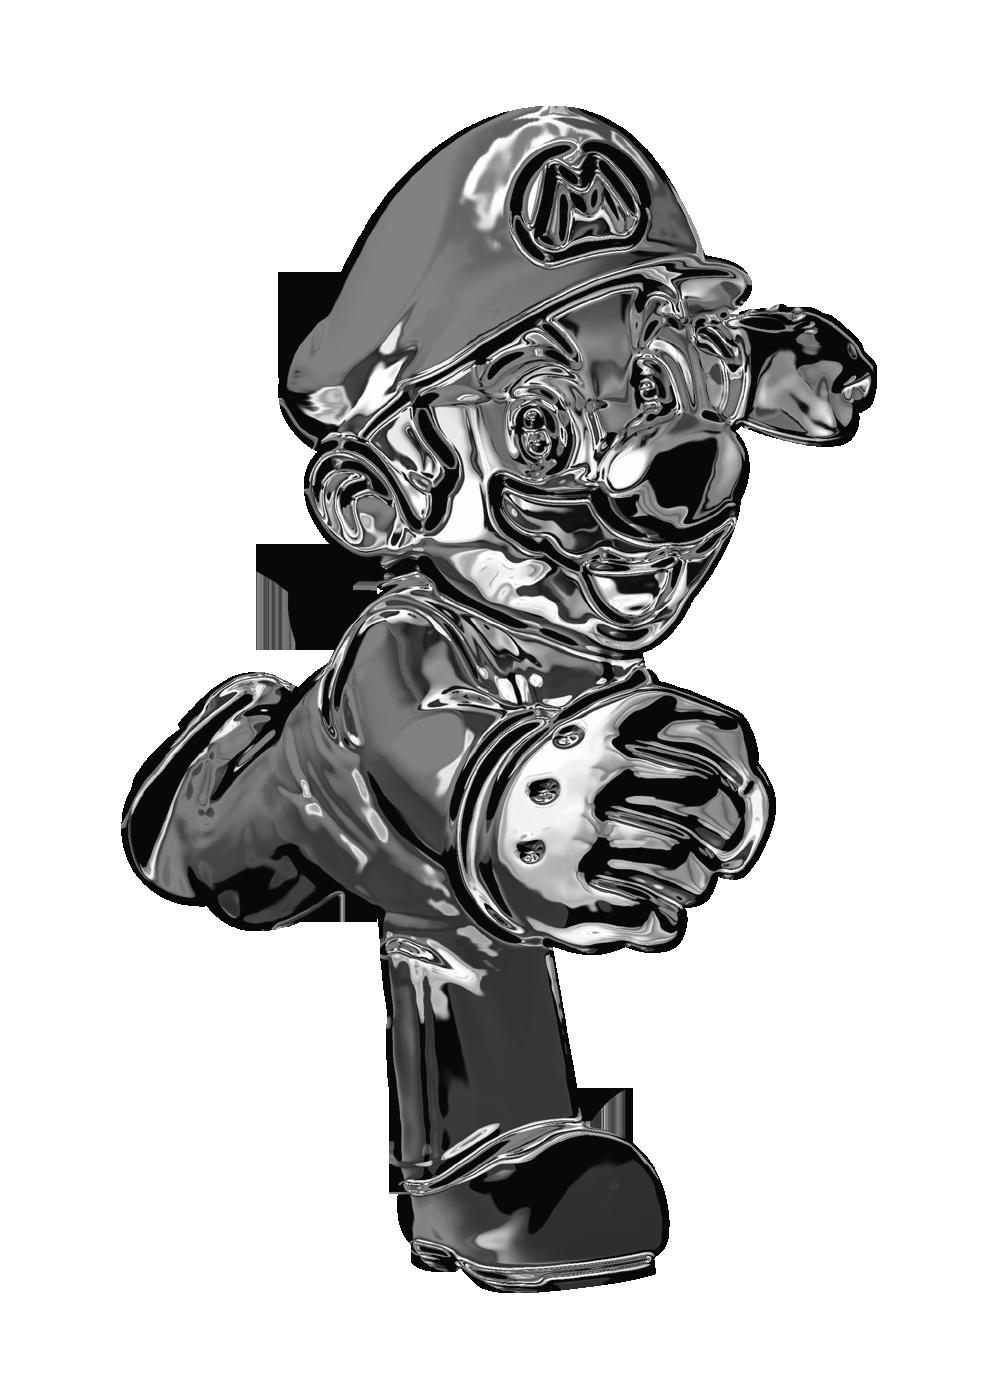 Metal Mario Power Up Fantendo Nintendo Fanon Wiki Fandom Powered By Wikia